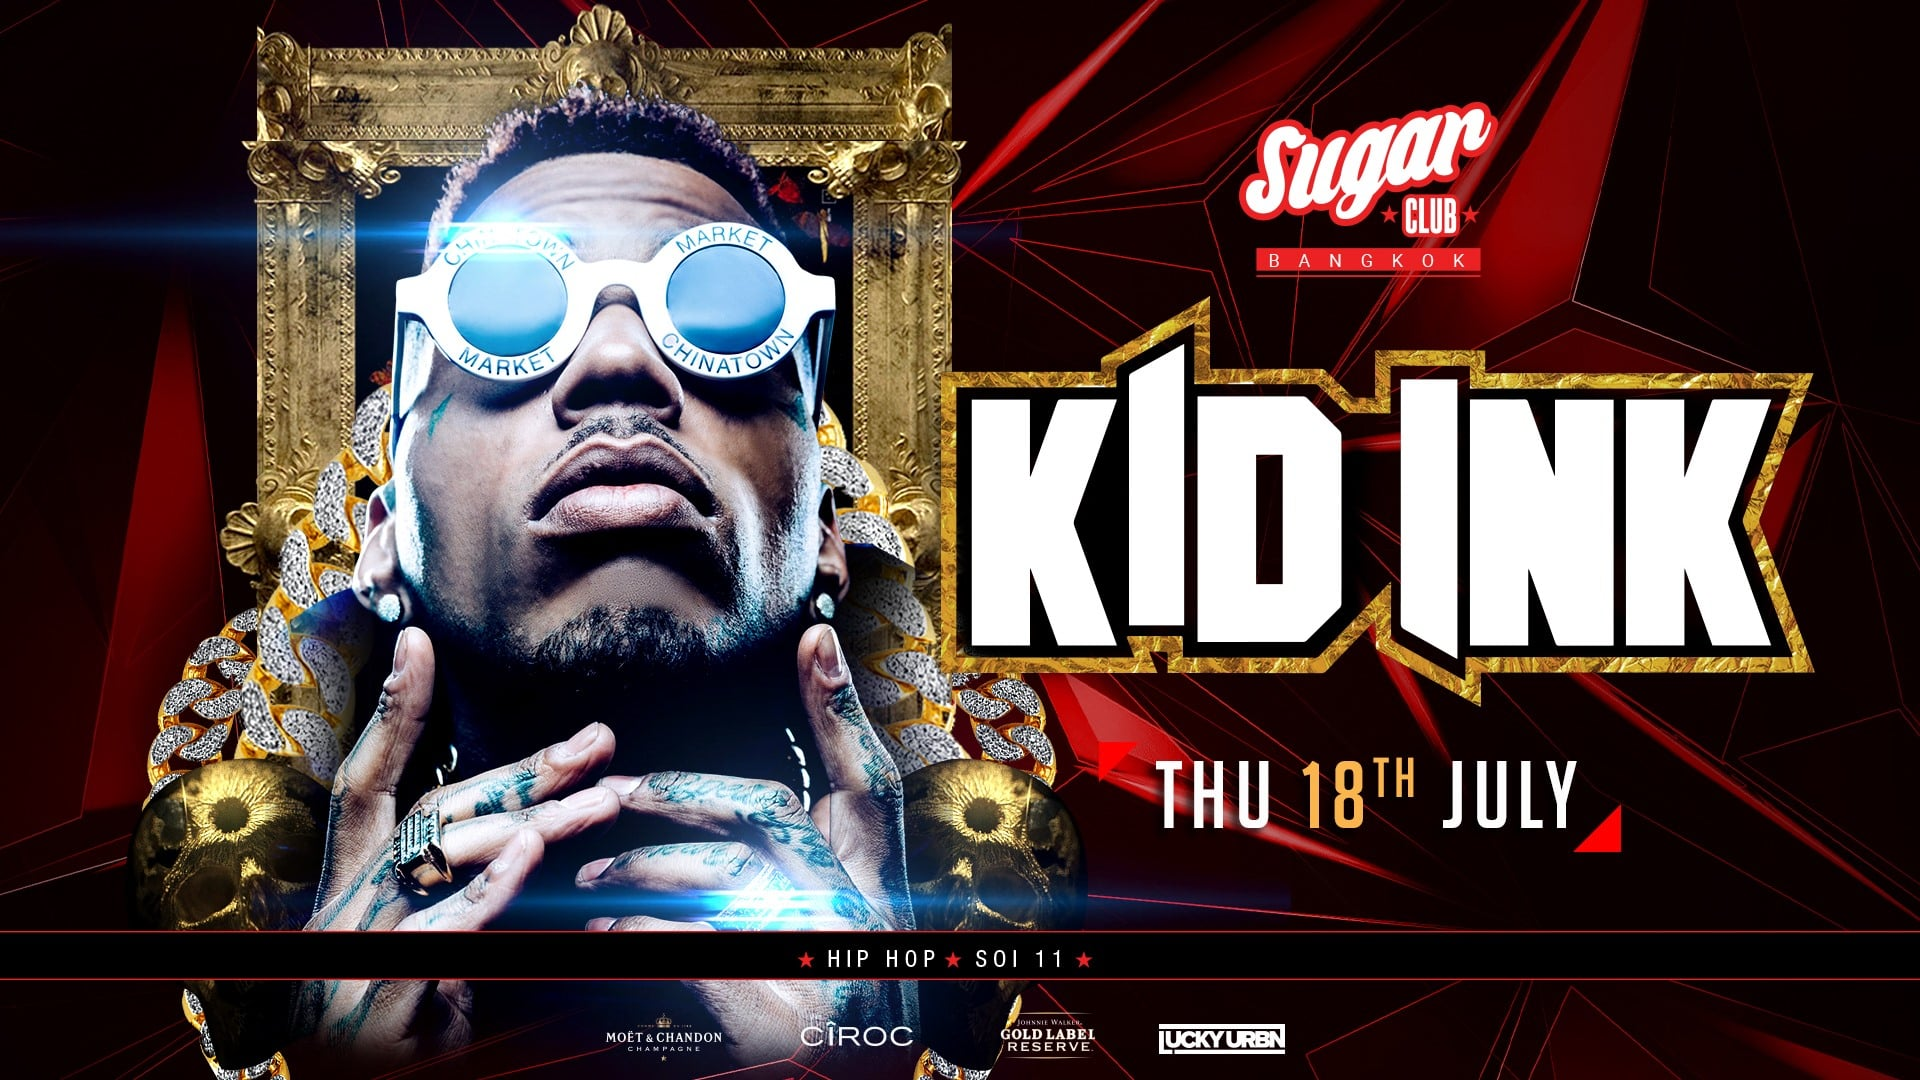 Kid Ink Tour 2020 18 Jul 19]Sugar Club Bangkok Presents Kid Ink!   Clubbing Thailand